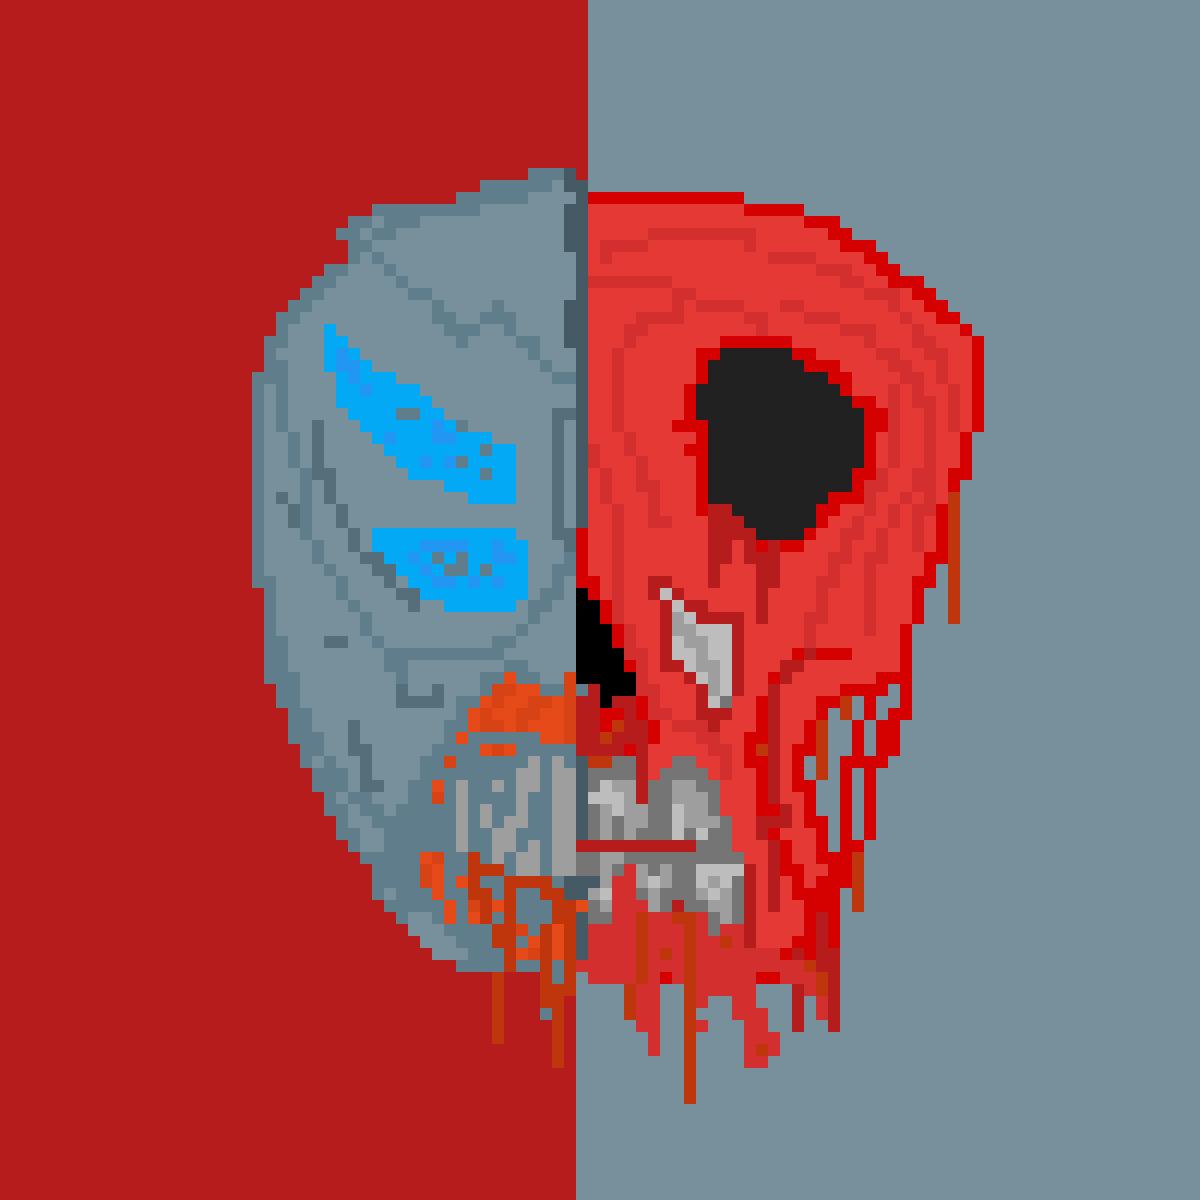 terror/blood zombie